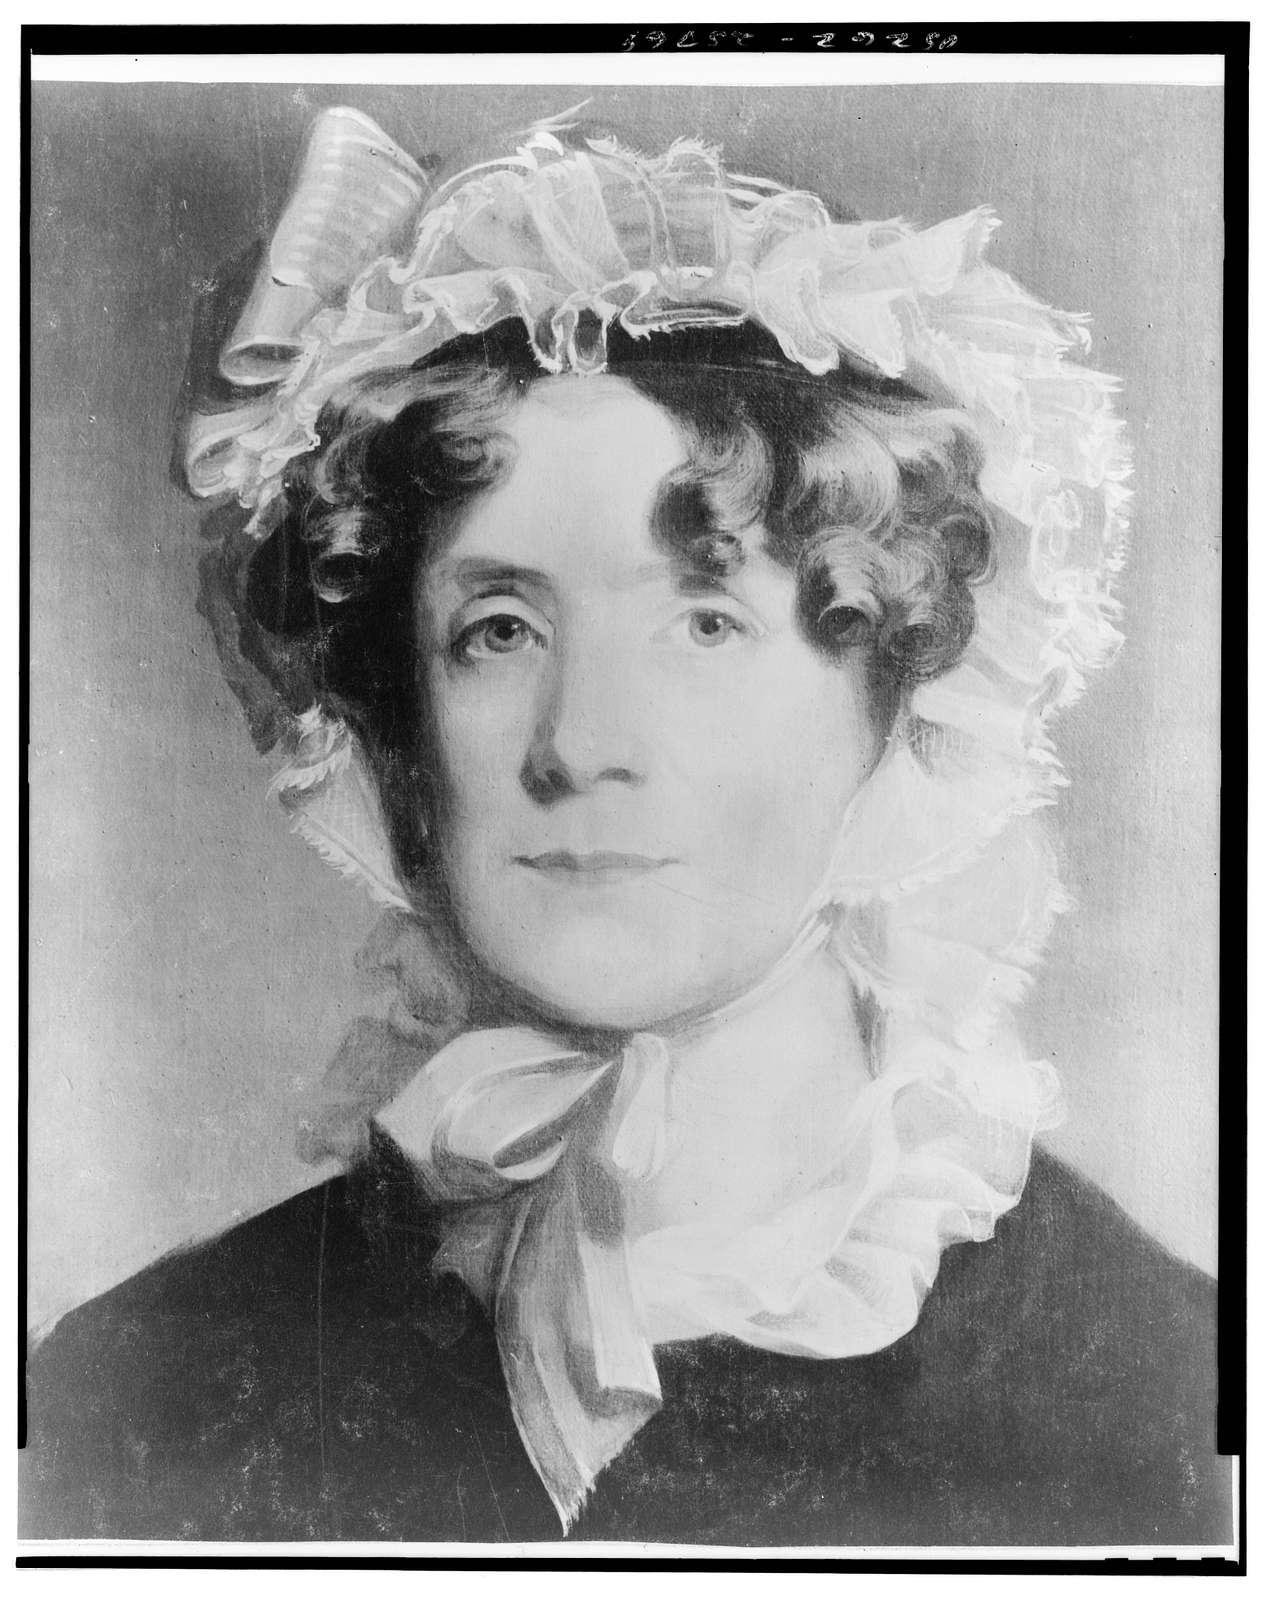 Martha Jefferson Randolph, daughter of Thomas Jefferson